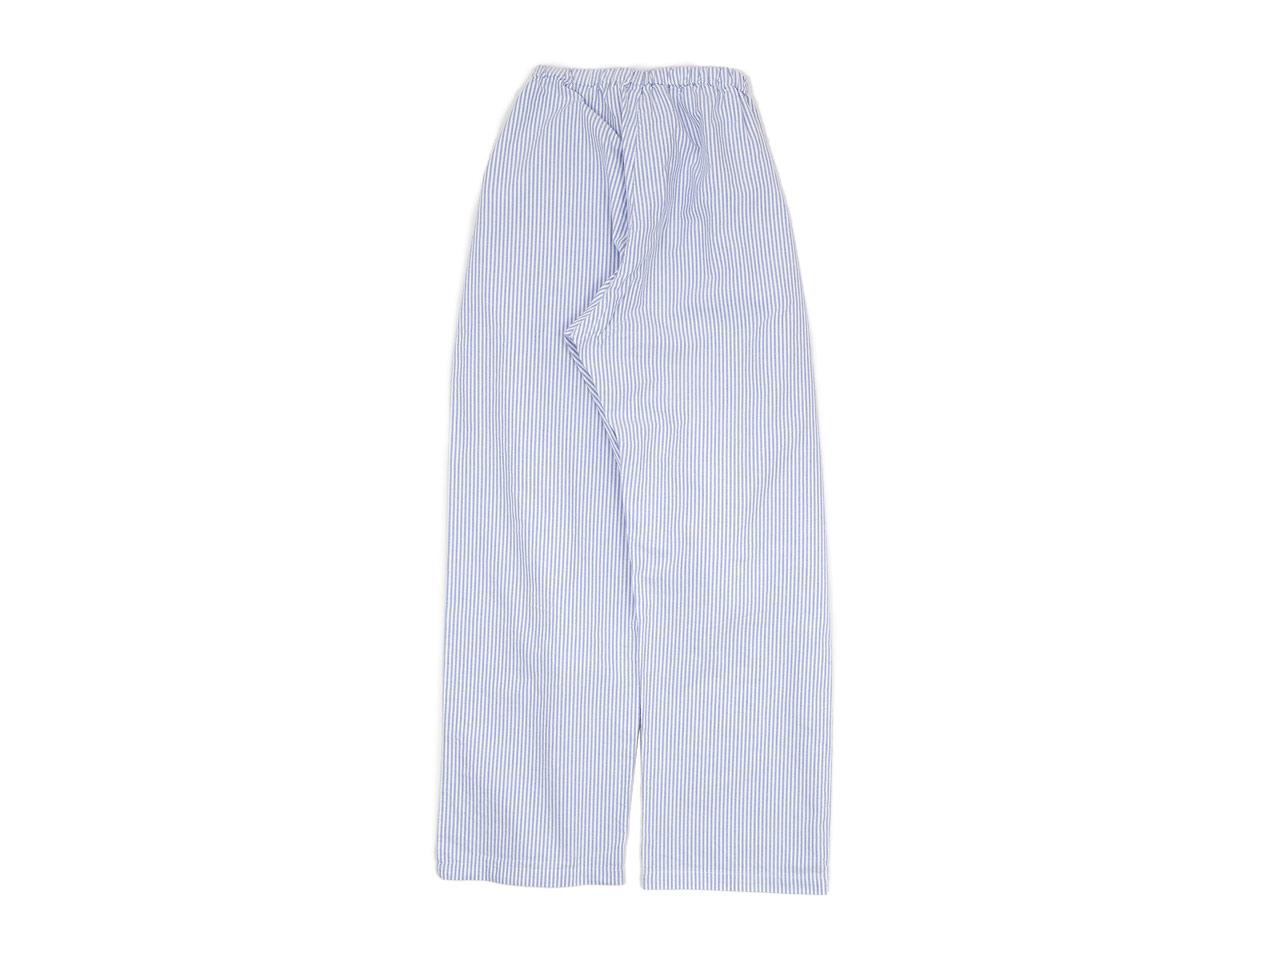 homspun コットンオックス パジャマ(巾着付き)